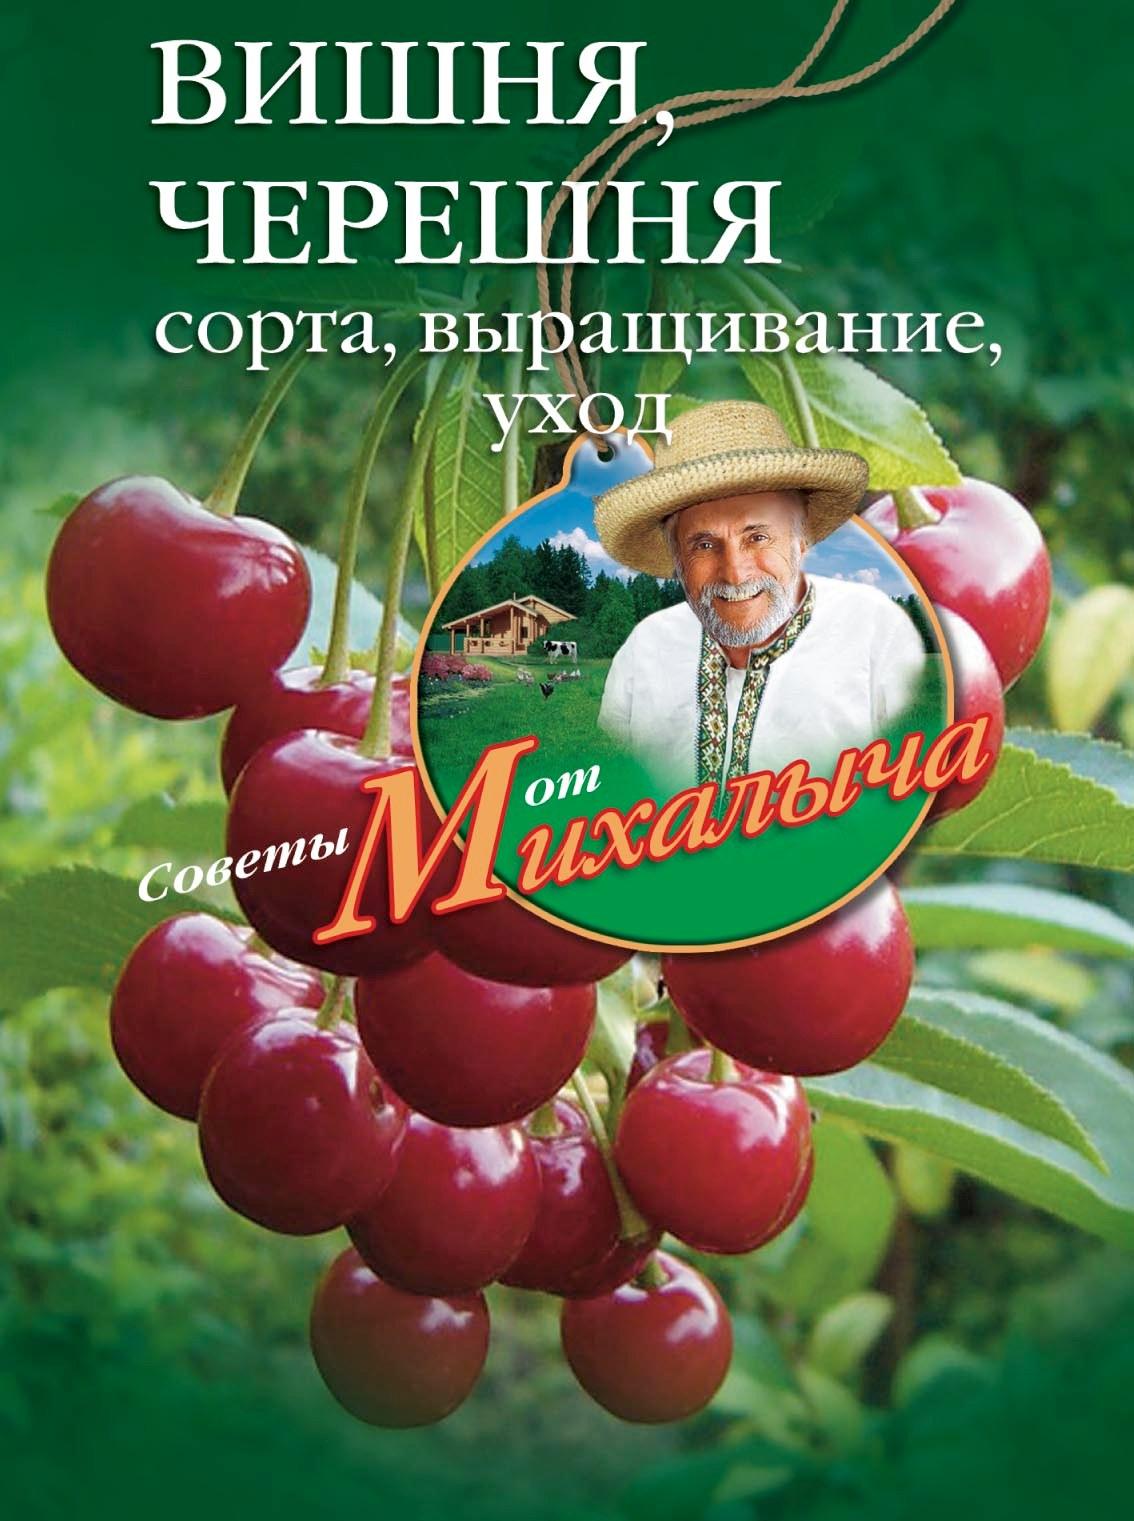 Николай Звонарев Вишня, черешня. Сорта, выращивание, уход, заготовки